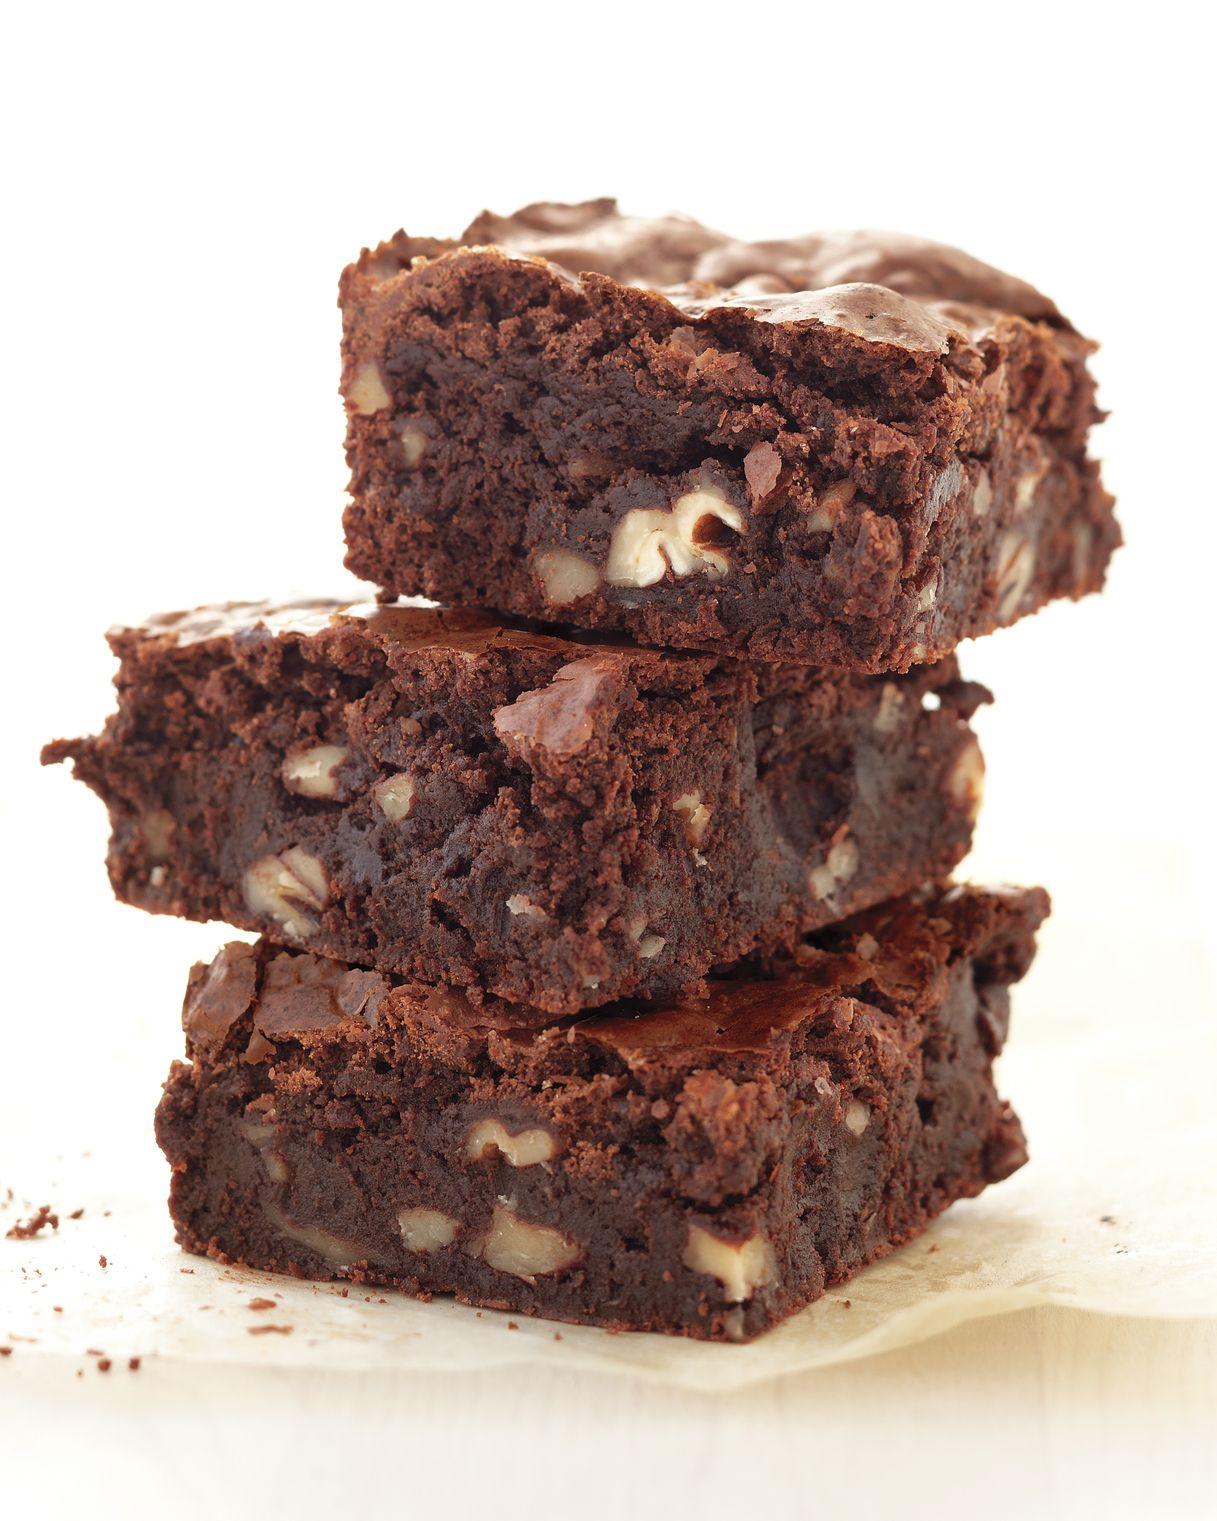 Martha Stewart Living's Best Brownie Recipes: Gluten-Free Fudgy Pecan Brownies